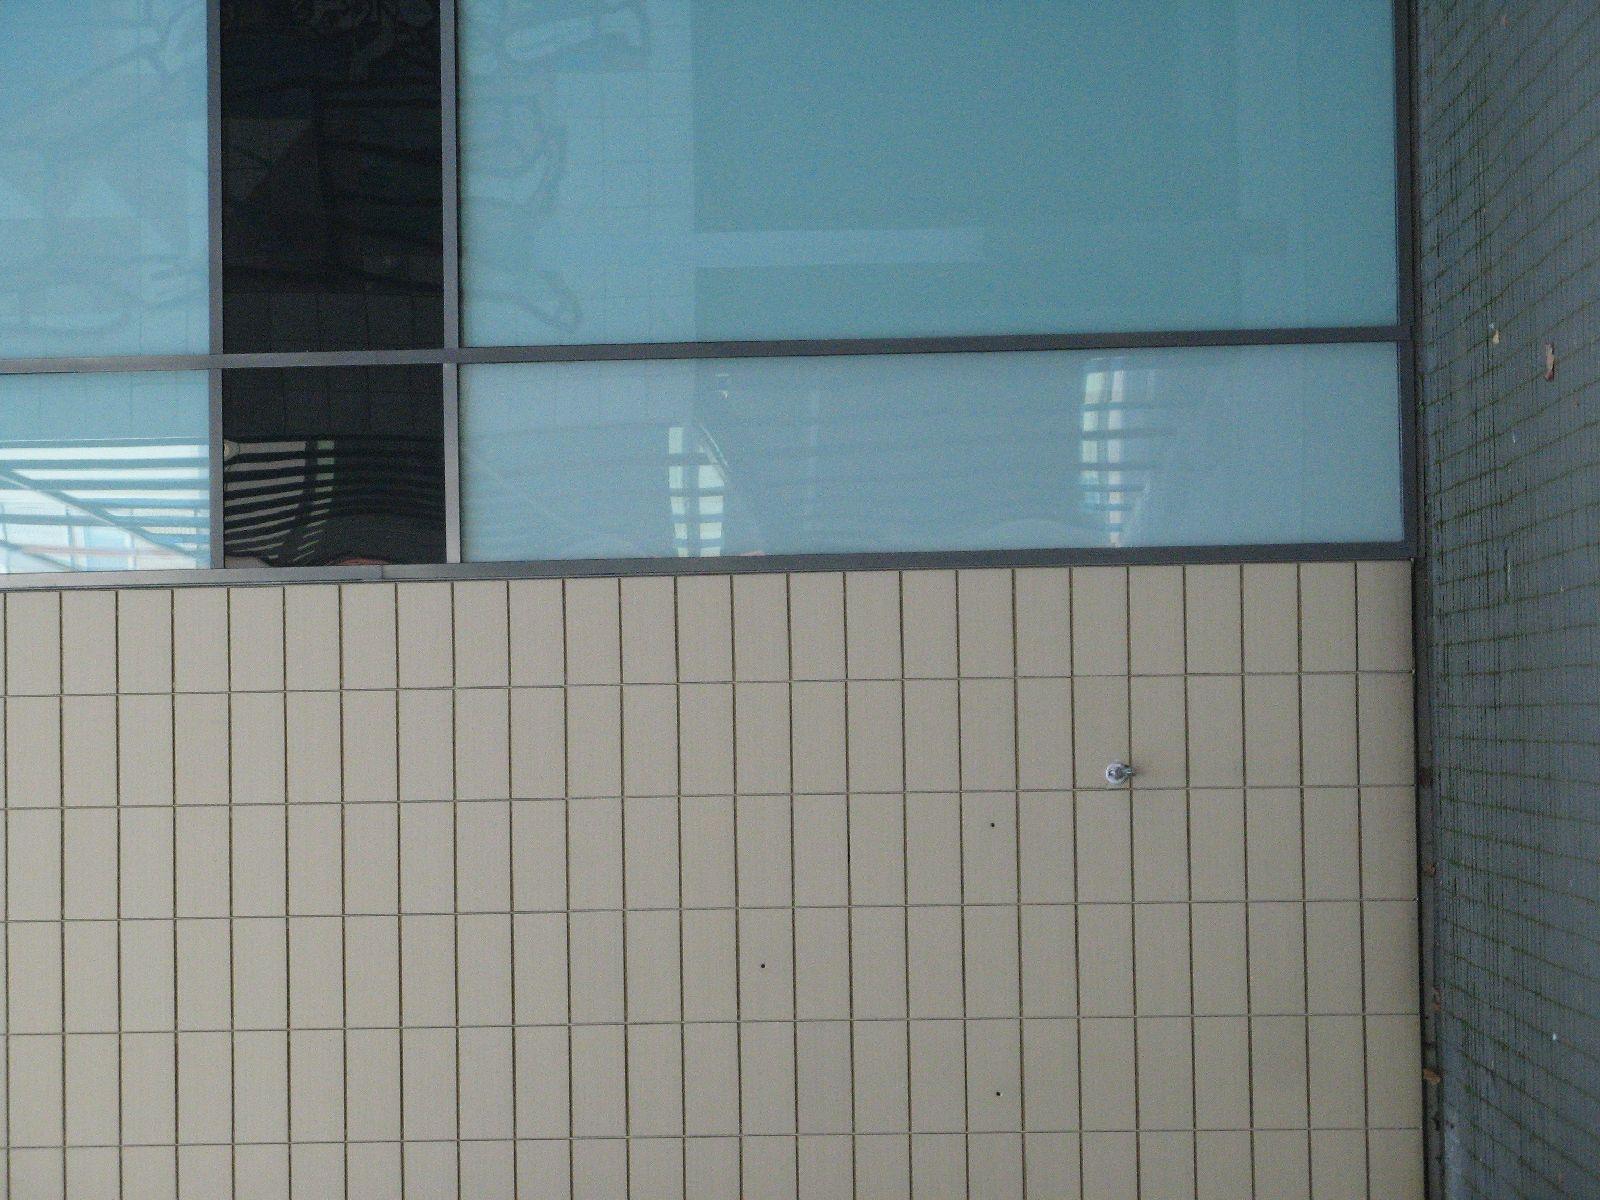 Gebaeude-Architektur_Textur_B_3600